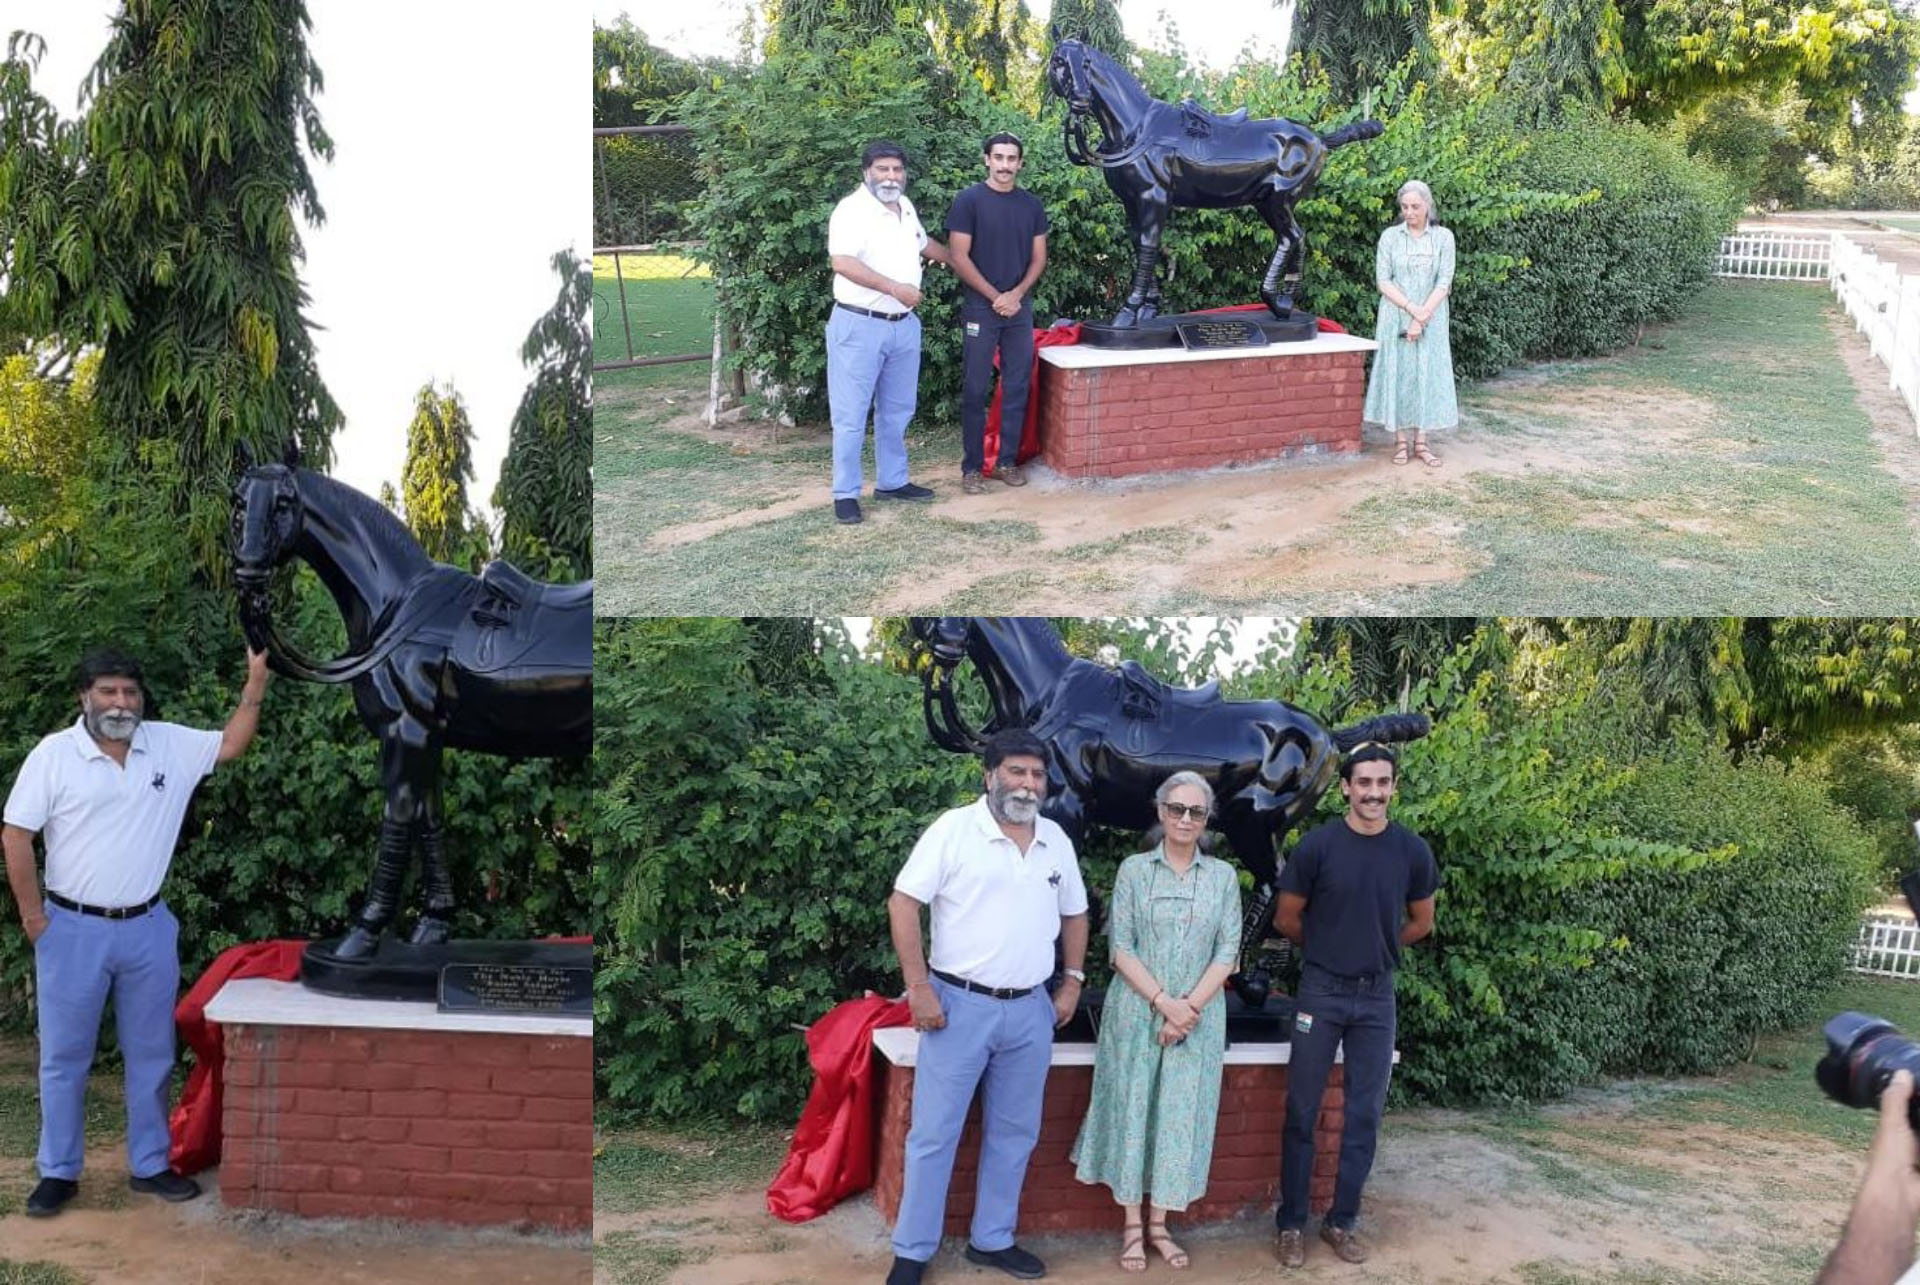 rajesh sahgal-vice-president-indian-polo-association-the-black-marble-house-rajasthan-polo-club-rambagh-jaipur-padmanabh-singh-deepshikha-sahgal